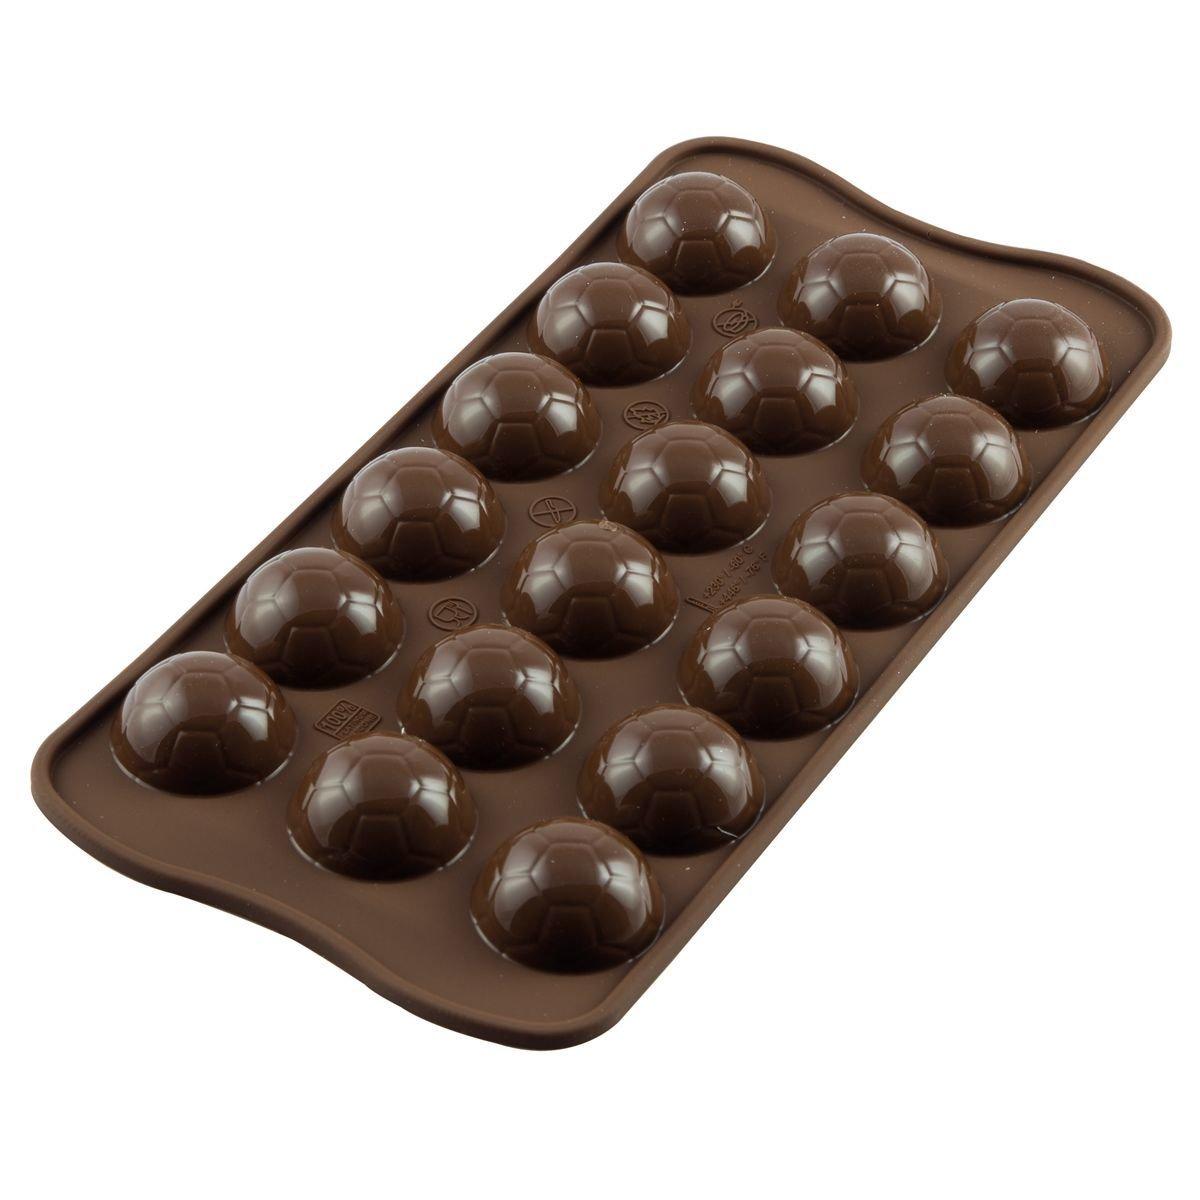 Silikomart Chocolate Mould Choco Goal - Καλούπι Σοκολάτας Ποδοσφαιρική Μπάλα - 2.7x1.35εκ